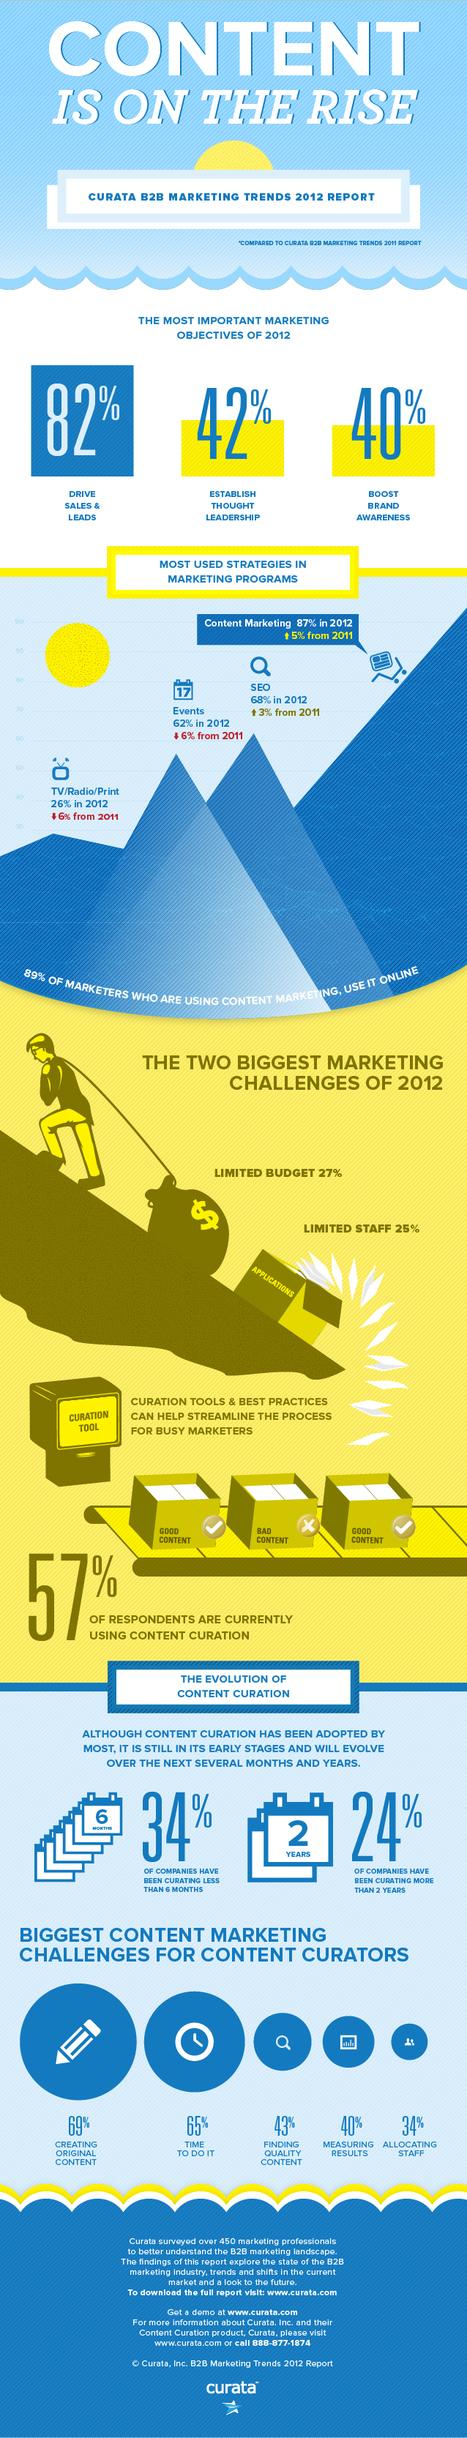 B2B Marketing Trends Survey 2012 Infographic - Curata | Curating ... What for ?! Marketing de contenu et communication inspirée | Scoop.it